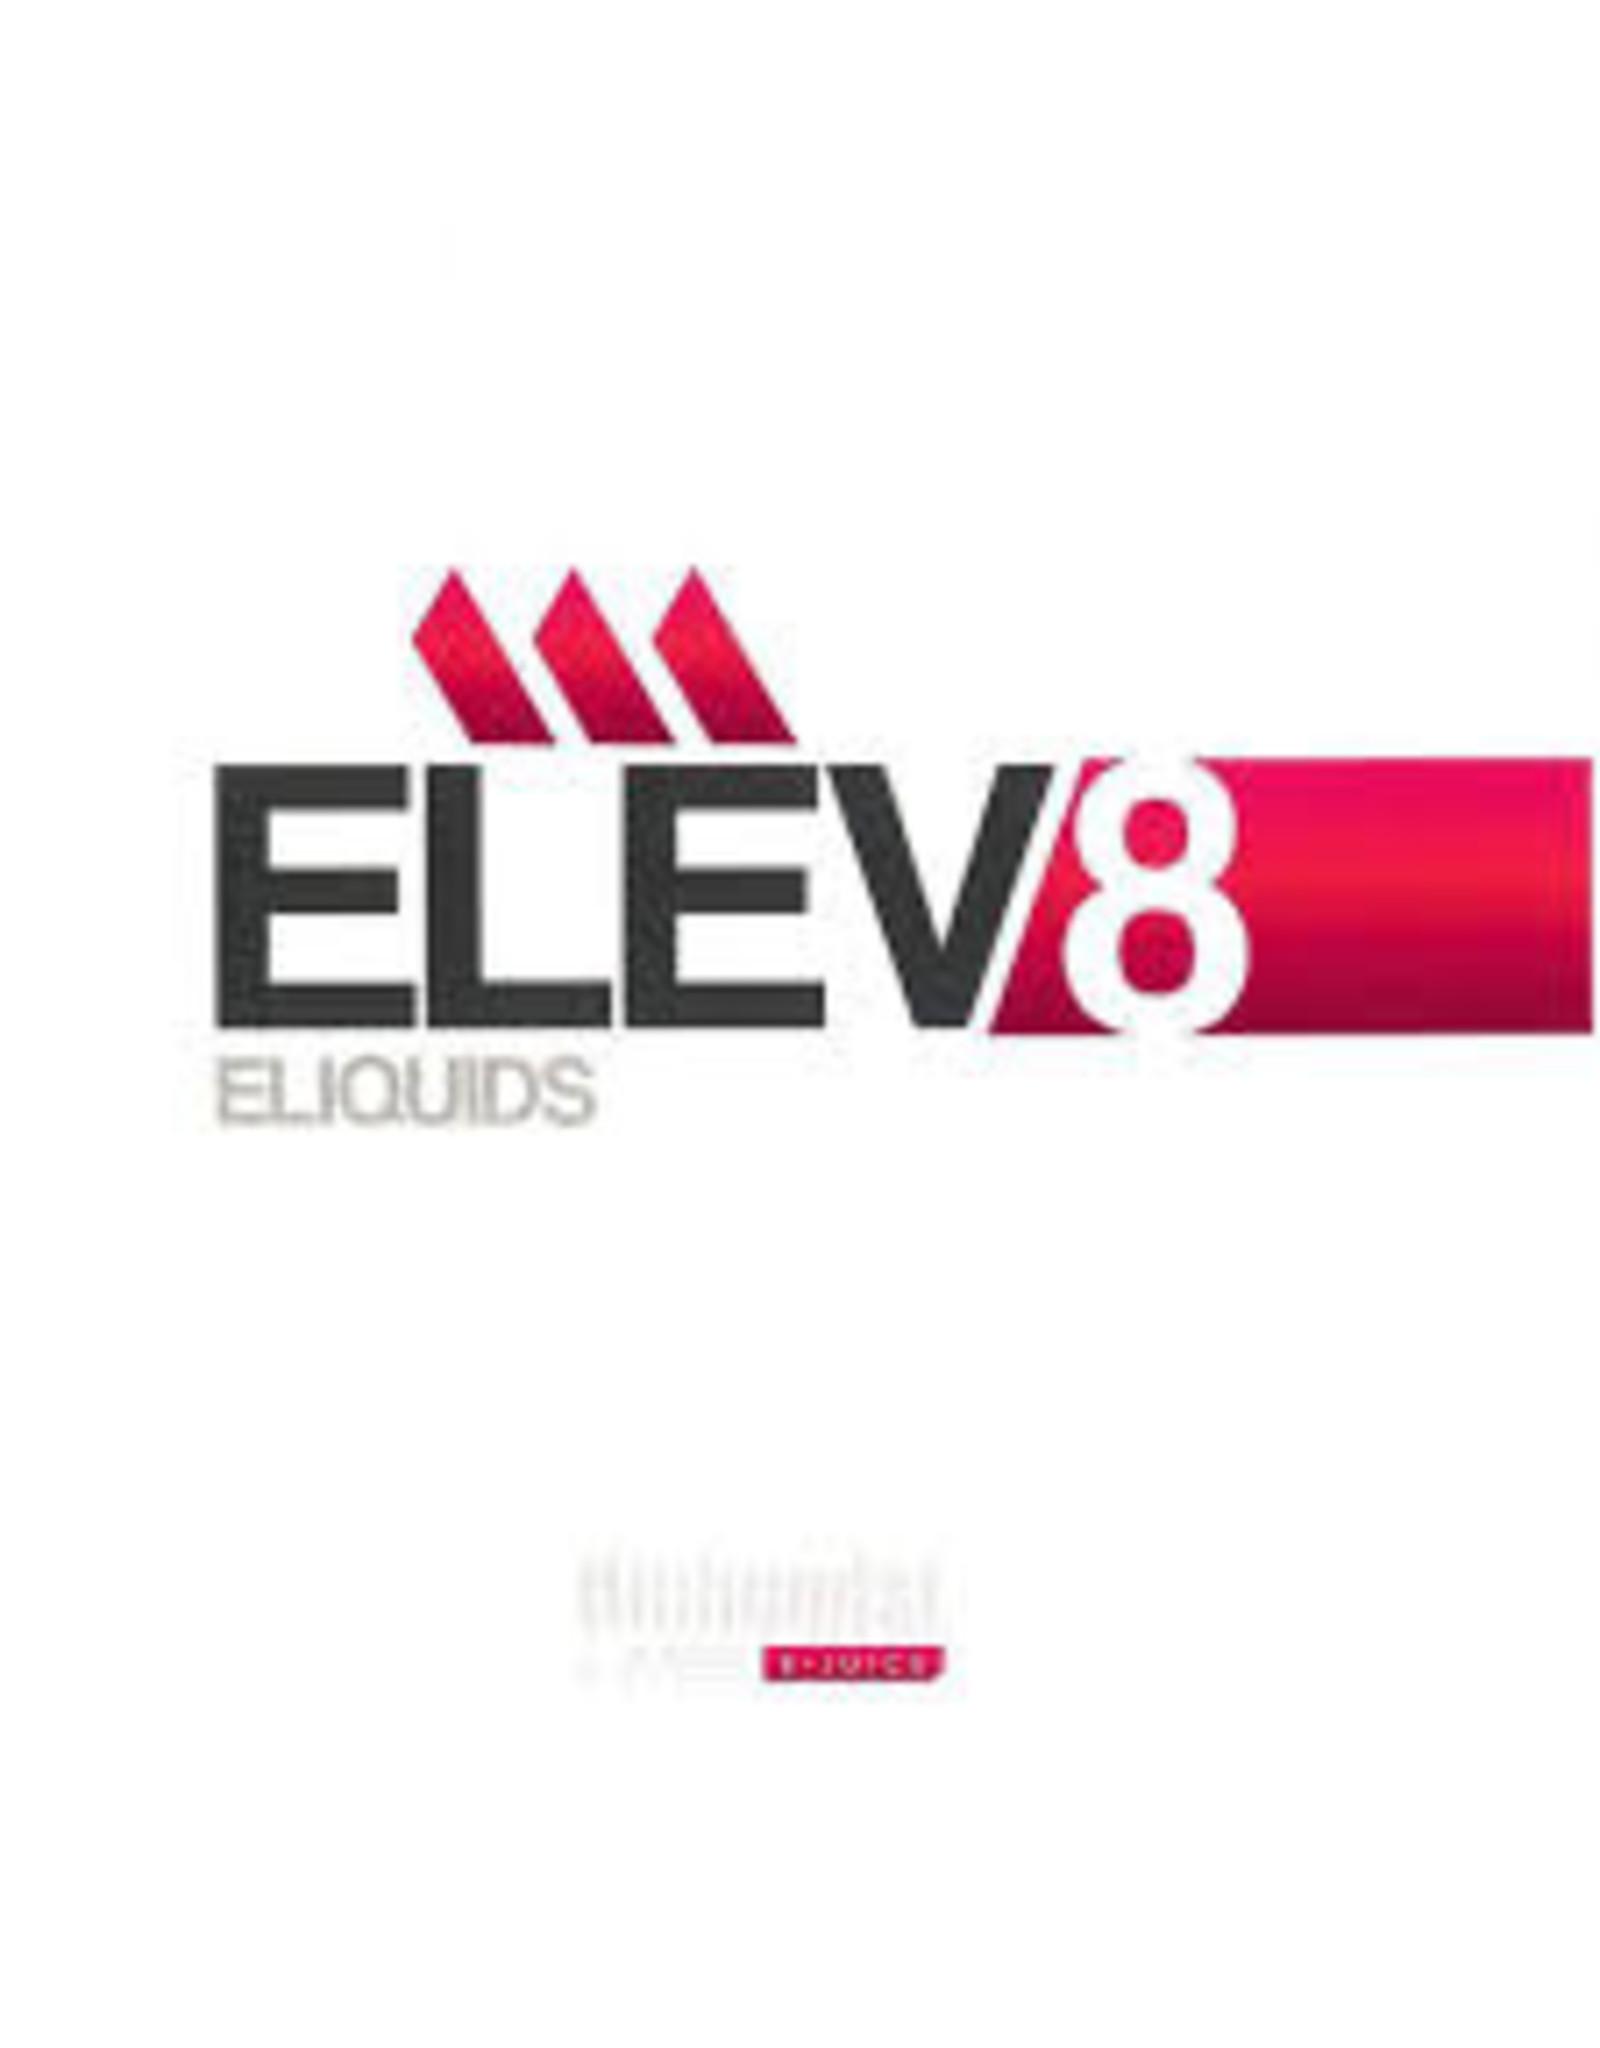 Alchemist Elev8 Eliquids